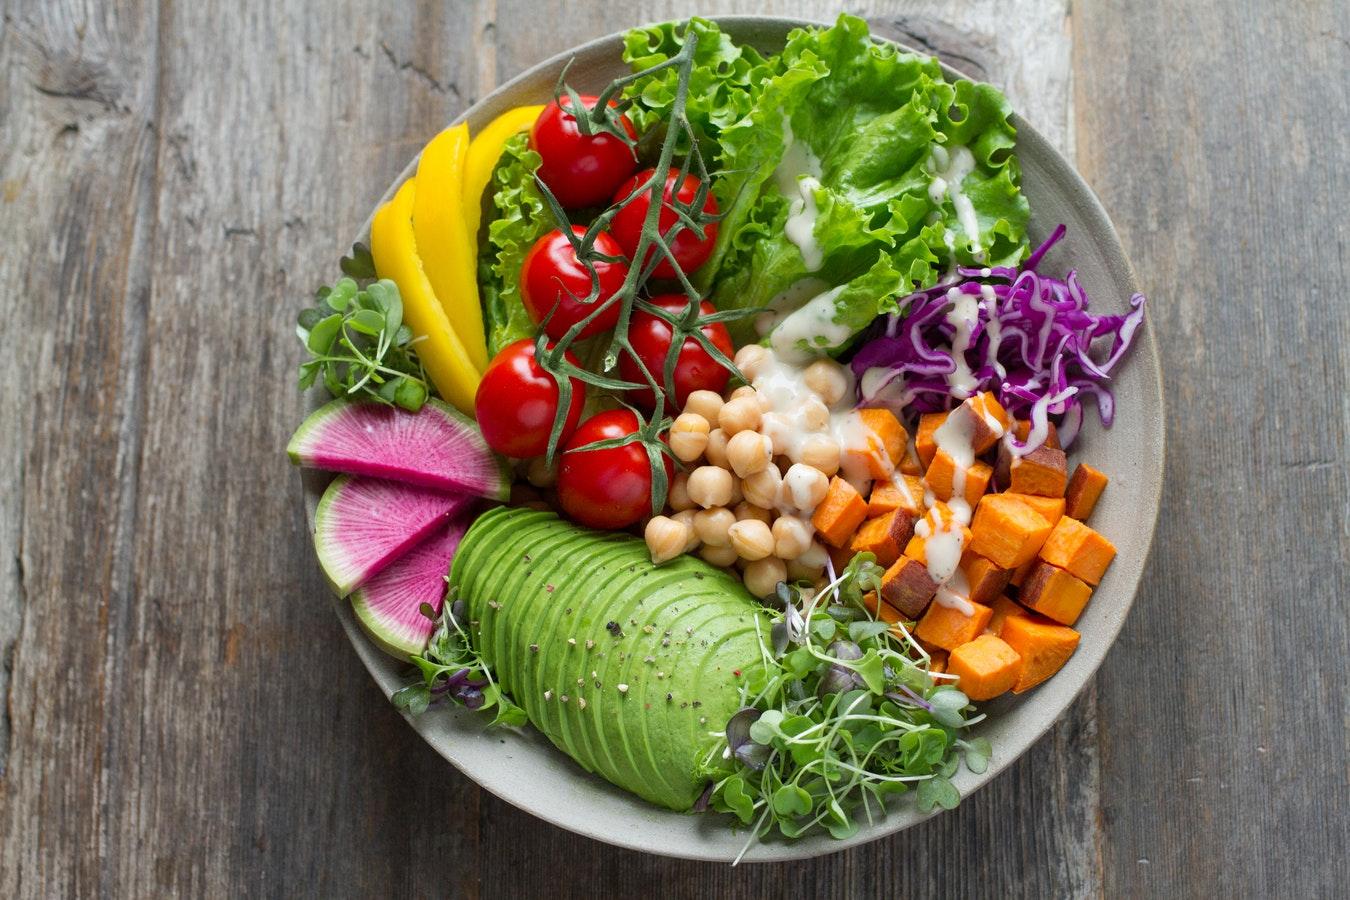 Kalorienarm Und Trotzdem Gut Diatgerichte Gesundheit Beauty